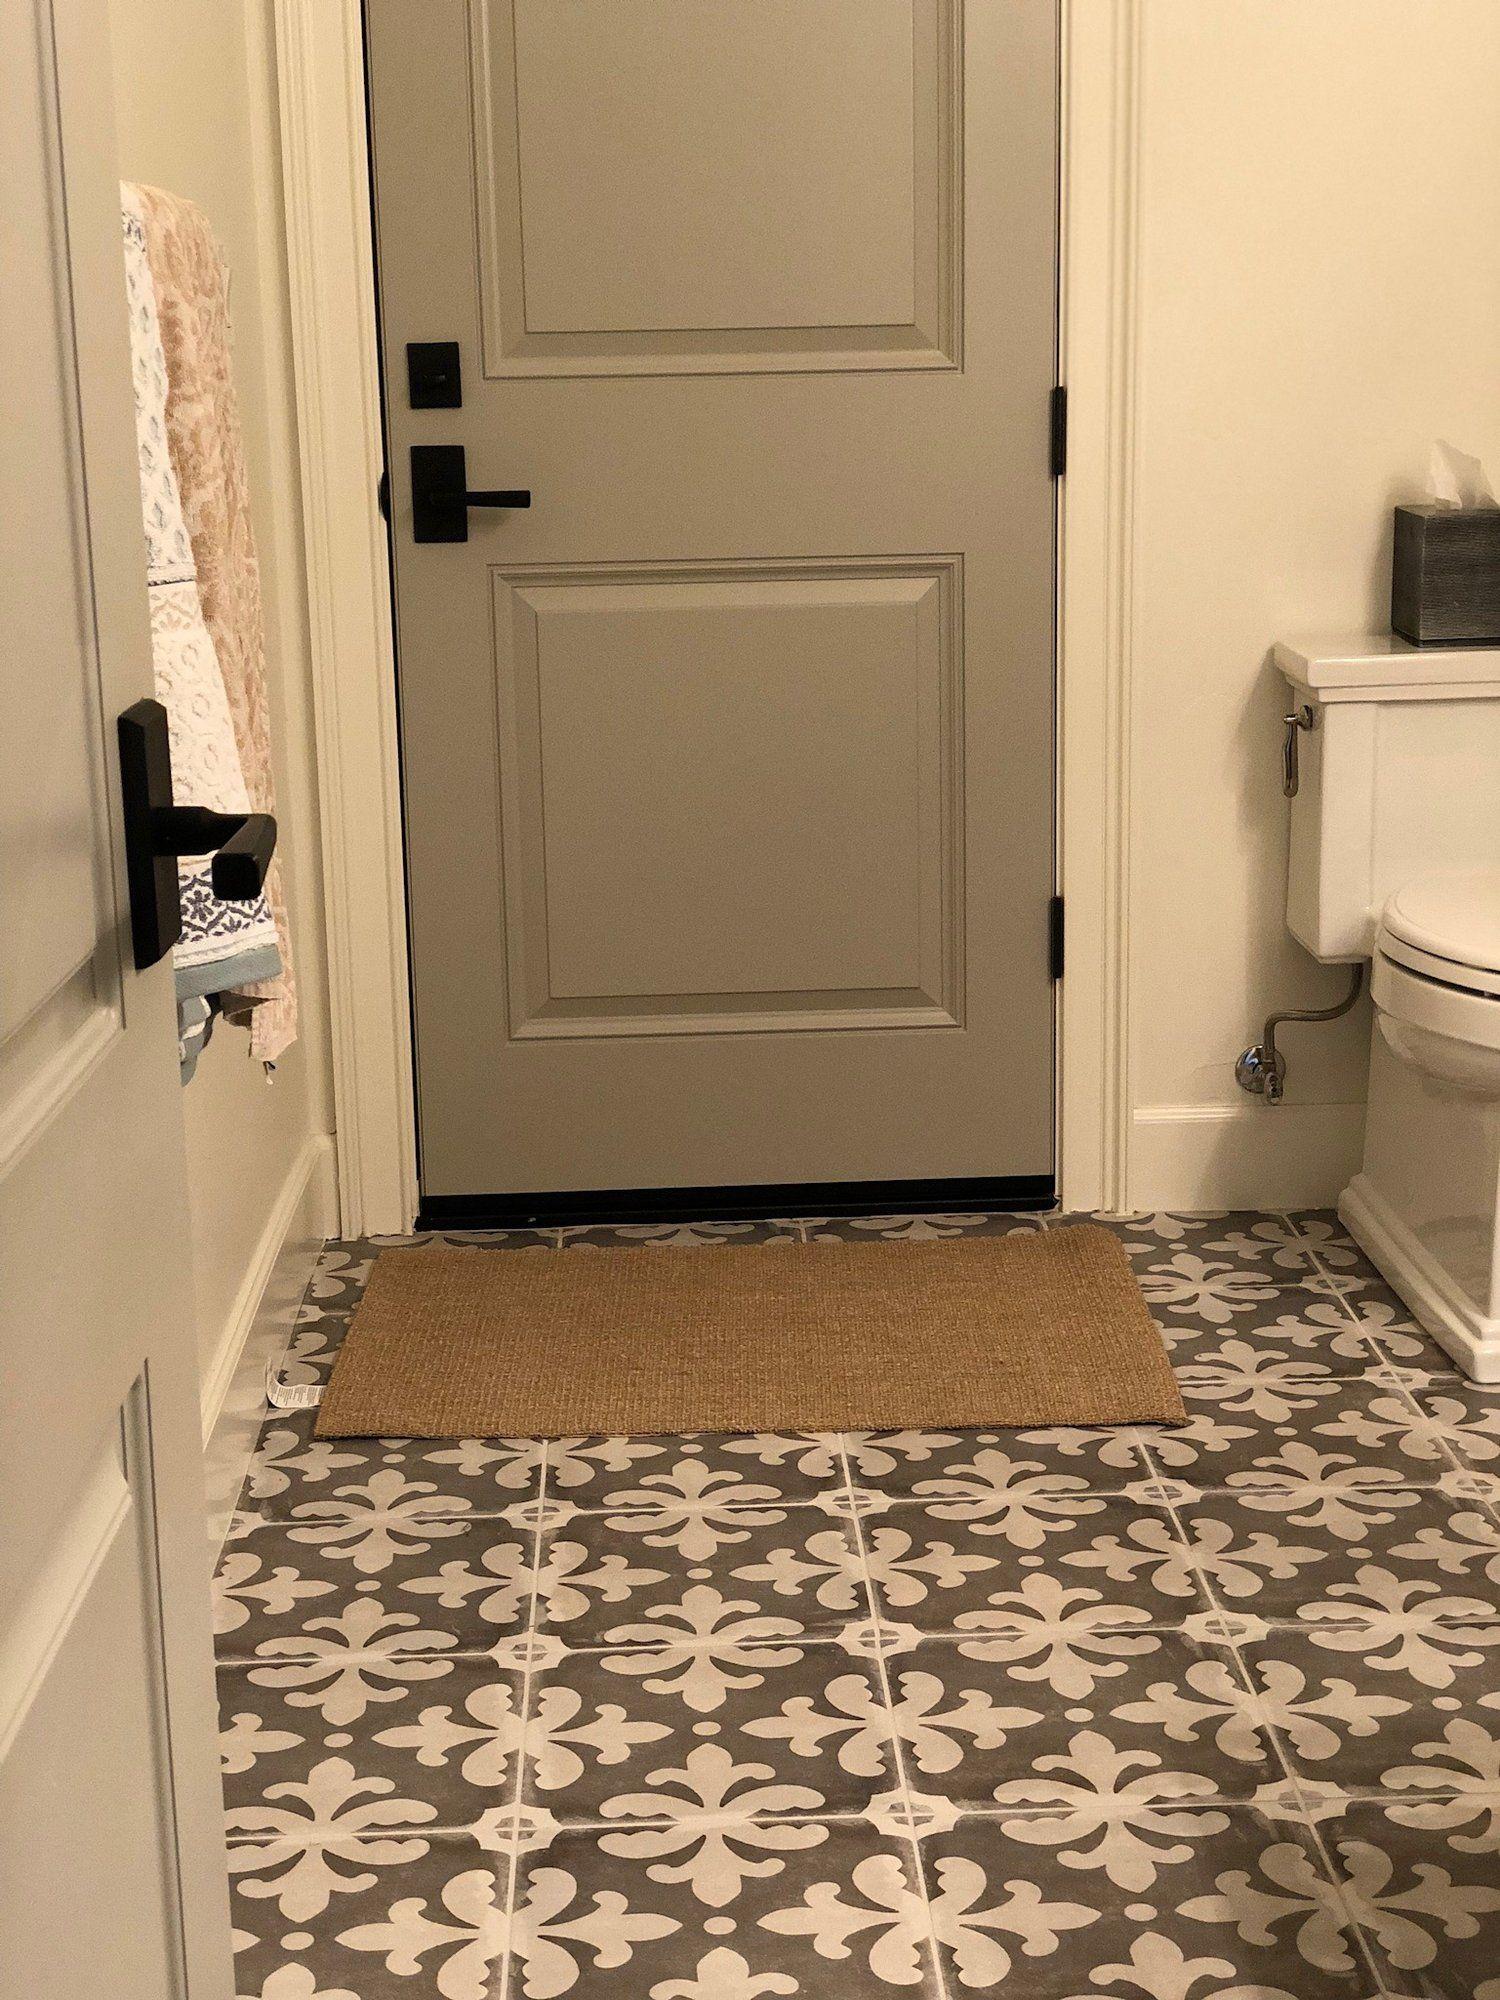 Bathroom Floor Tile Fun Bathroom Ideas Tile Inspiration